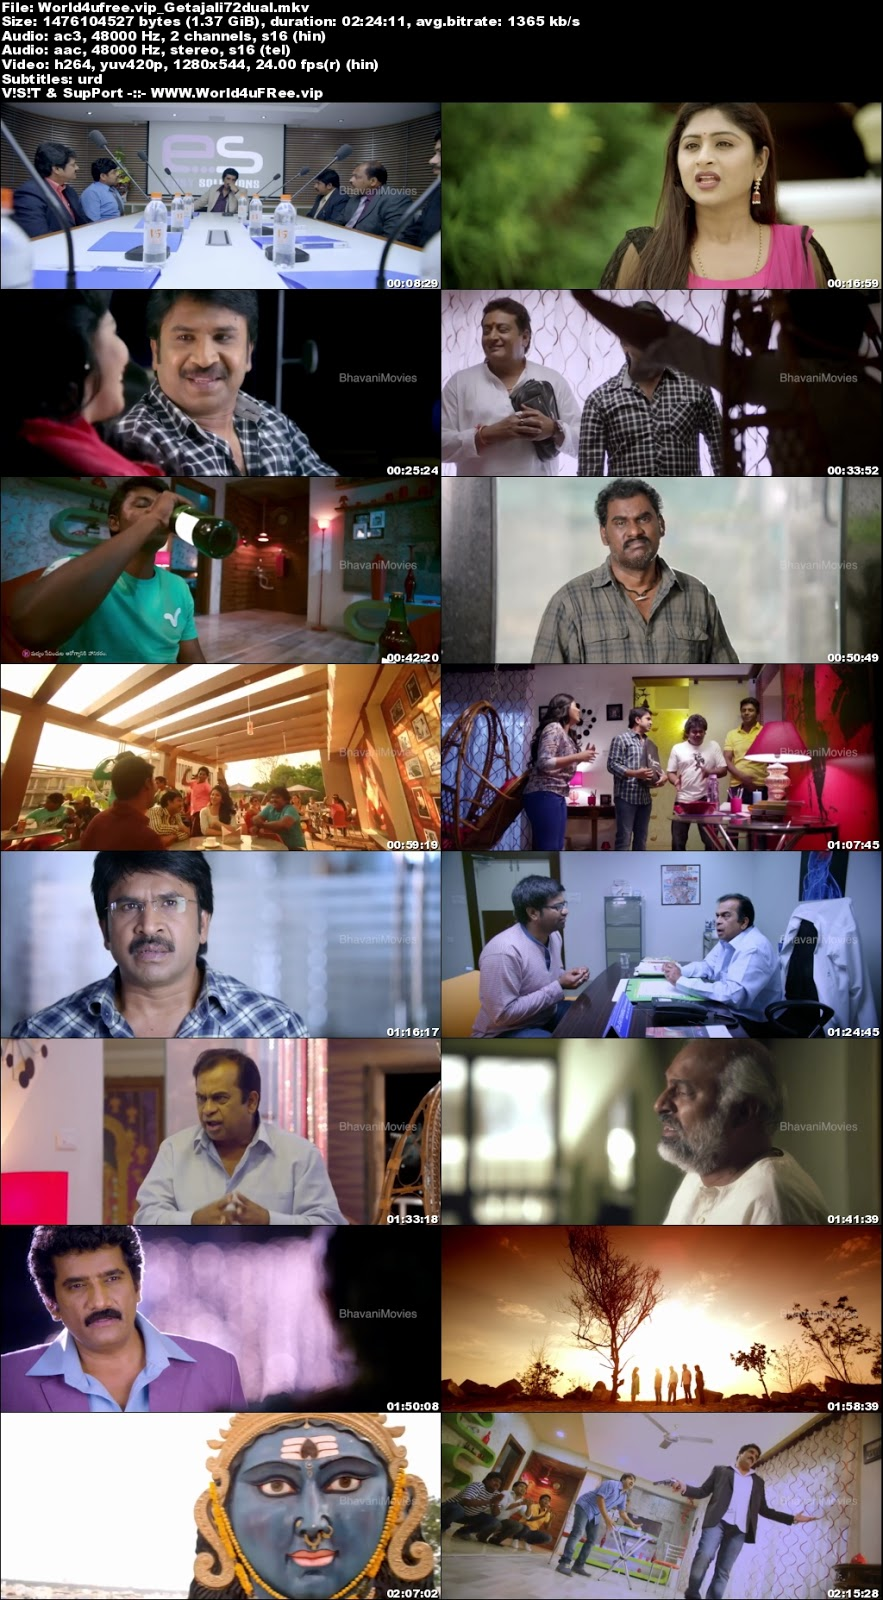 Geethanjali 2014 Dual Audio 720p UNCUT HDRip Download world4ufree.fun , South indian movie Geethanjali 2014 hindi dubbed world4ufree.fun 720p hdrip webrip dvdrip 700mb brrip bluray free download or watch online at world4ufree.fun